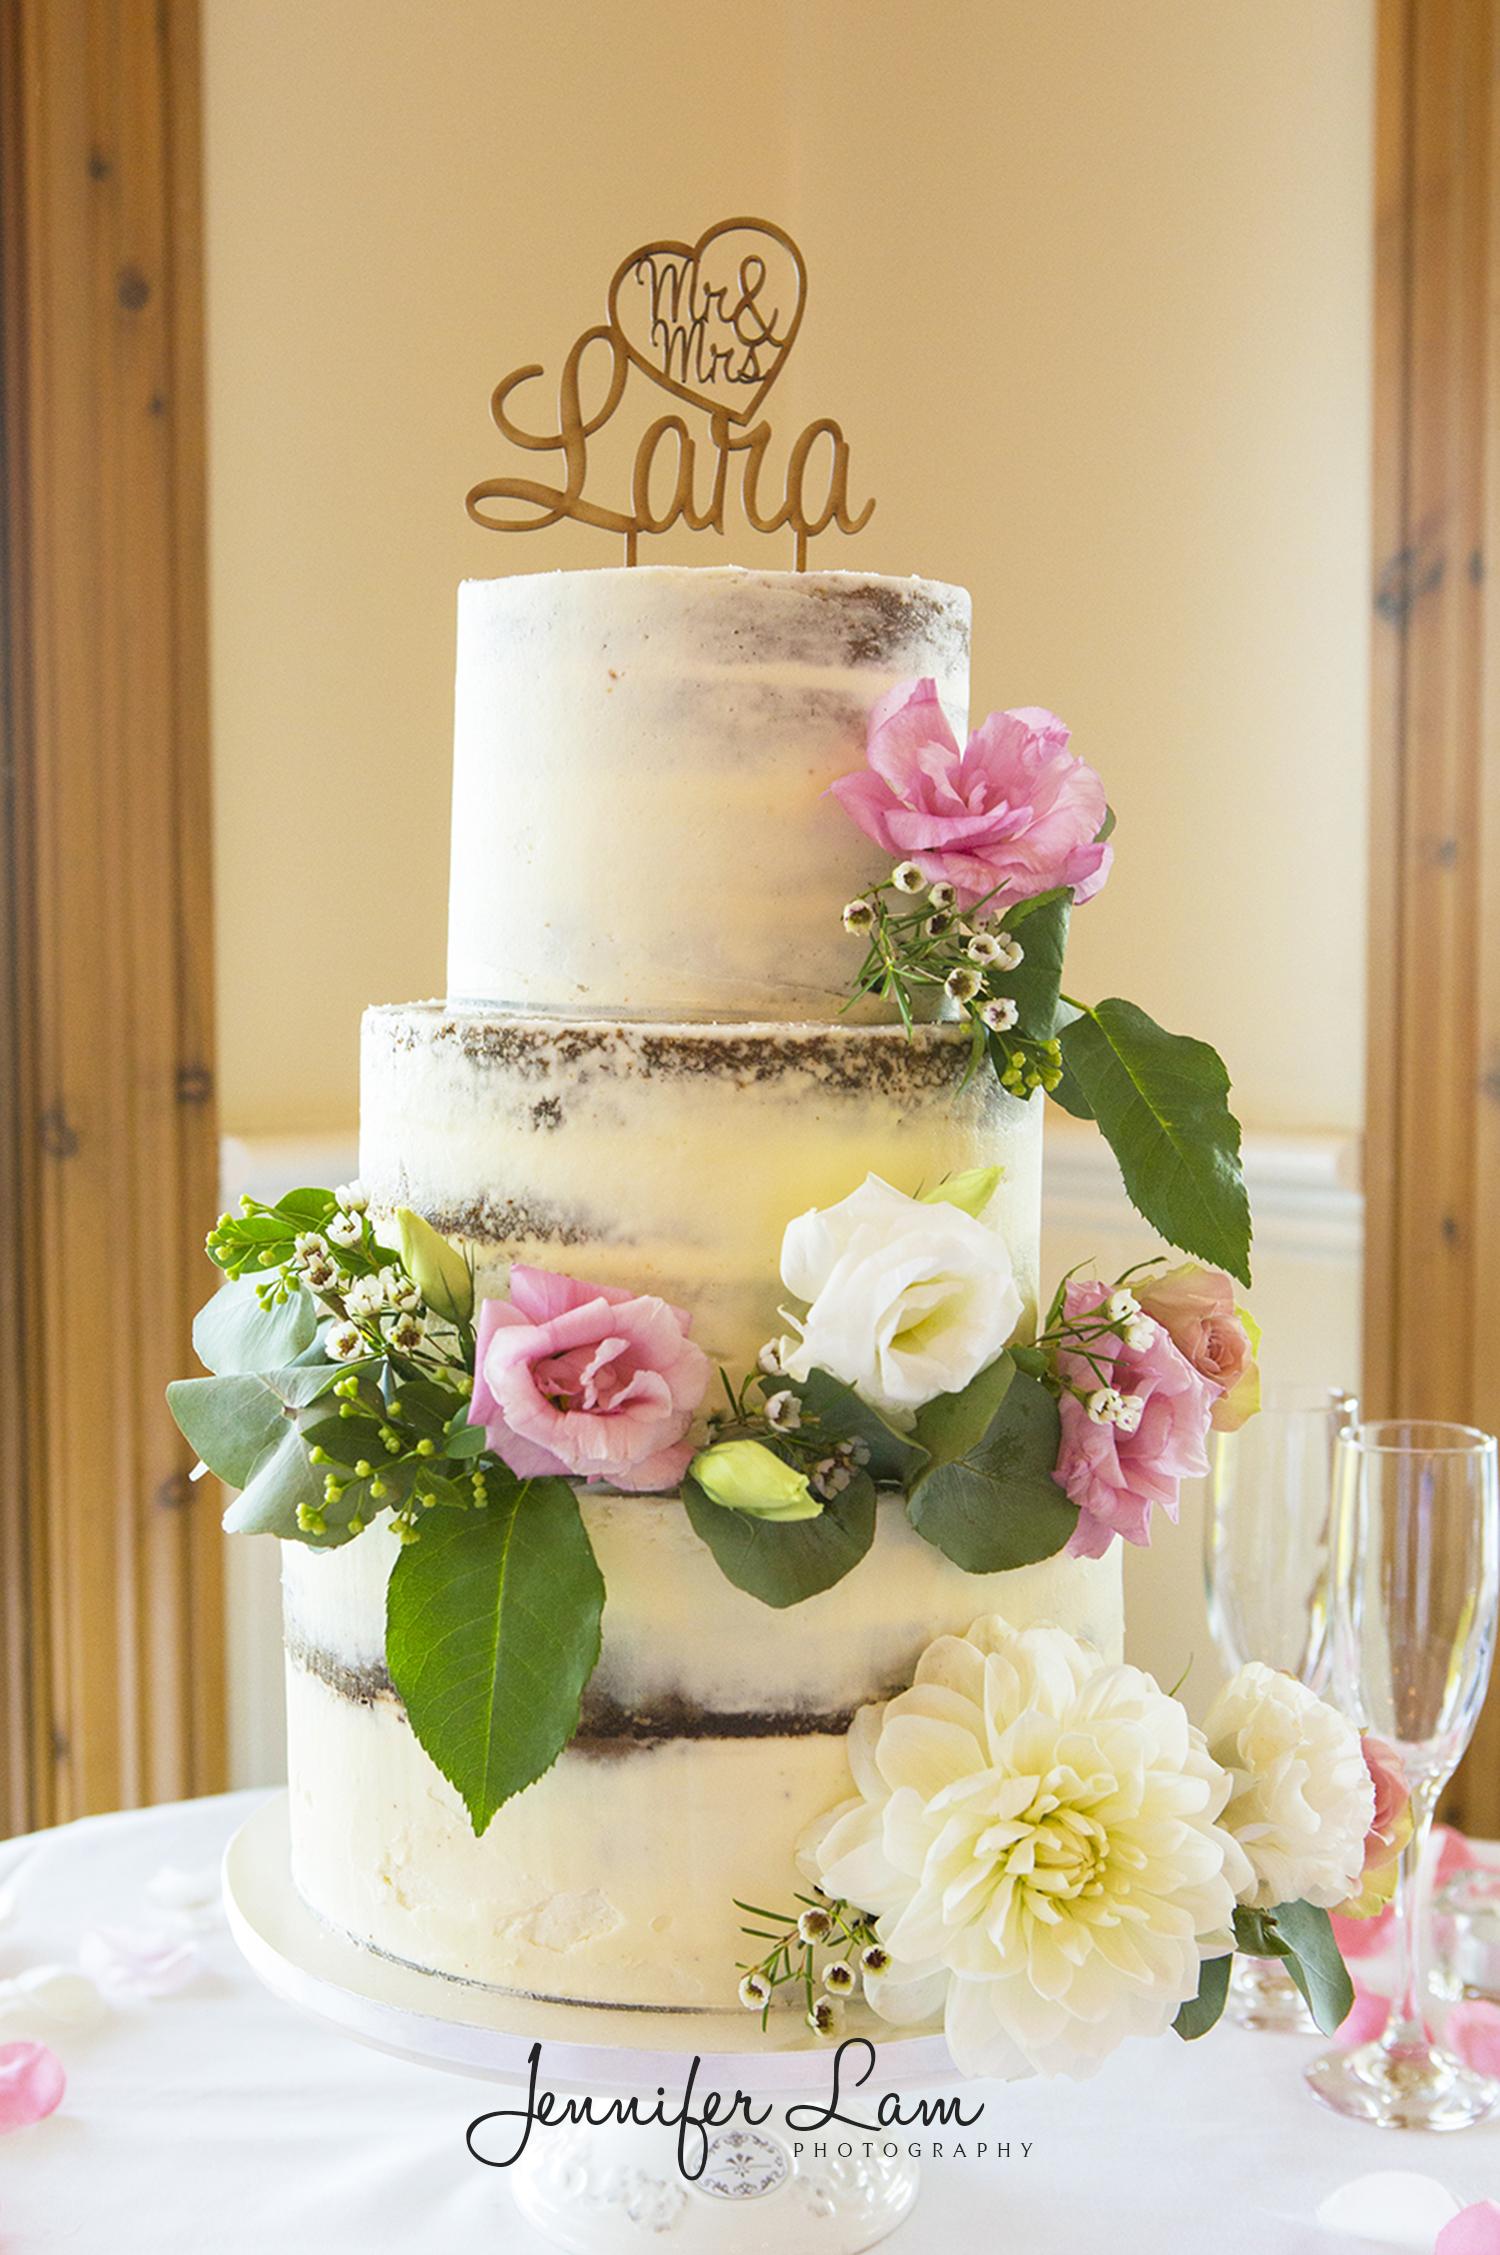 Sydney Wedding Photographer - Jennifer Lam Photography - www.jenniferlamphotography (55).jpg